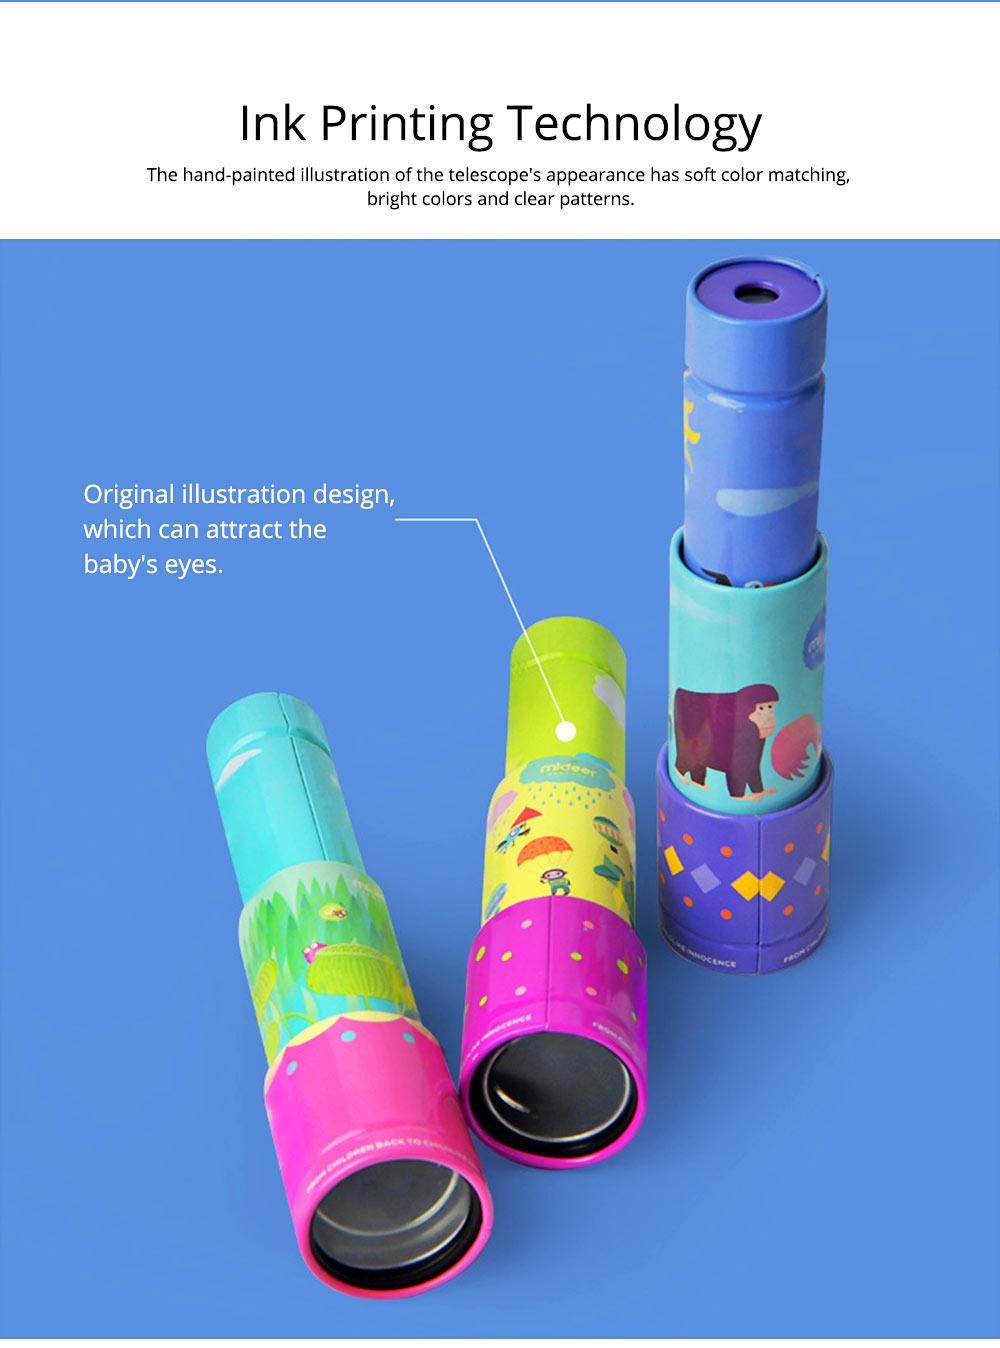 Explore Nature Children's Monocular Telescope, Iron Retractable Eyecare Toy, Adjustable Educational Science Toy 3